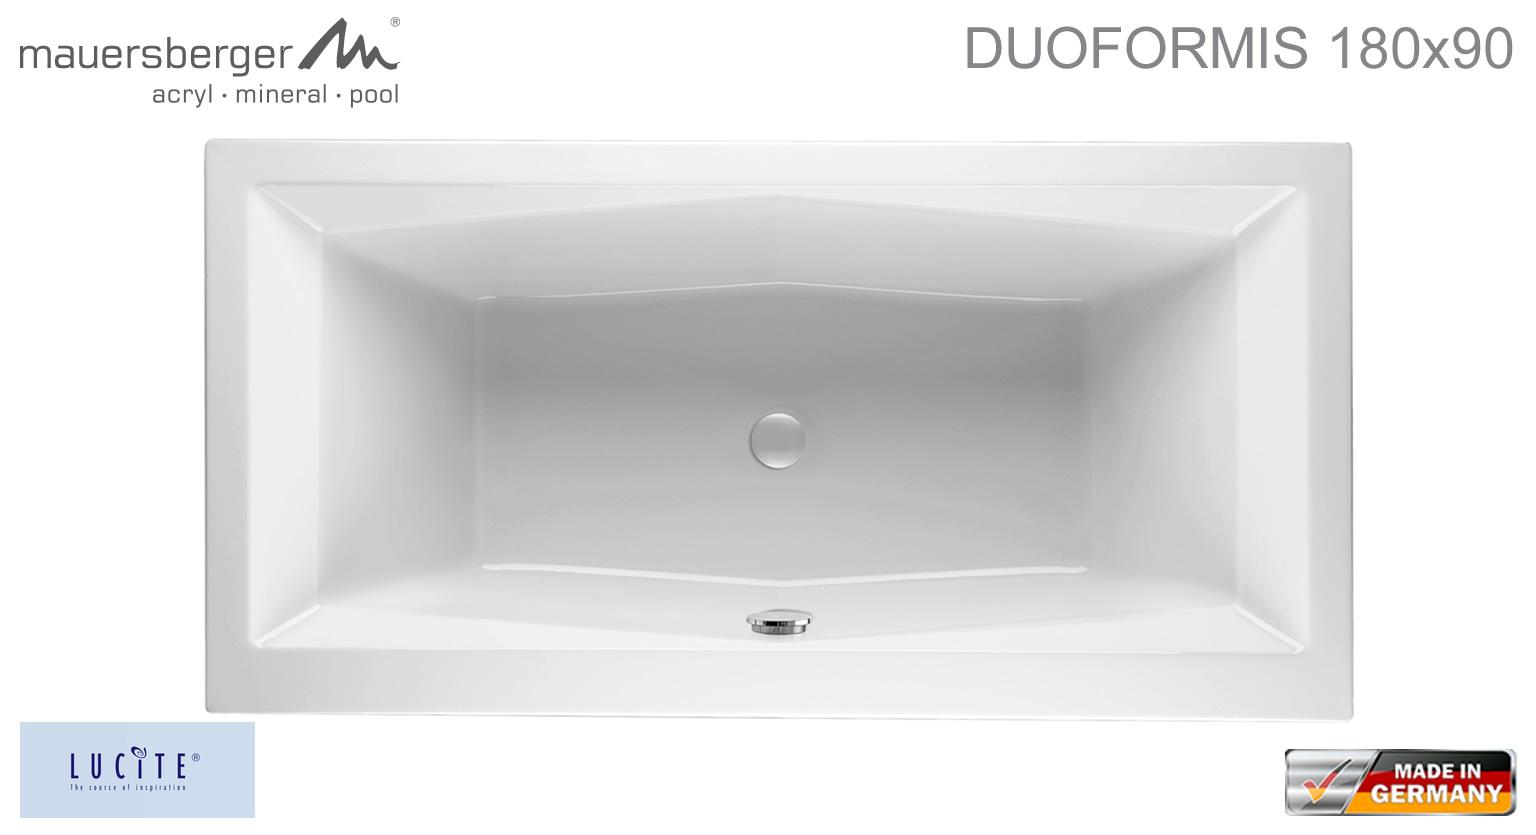 mauersberger badewanne duoformis 180 x 90 cm rechteck acryl badewanne impulsbad. Black Bedroom Furniture Sets. Home Design Ideas